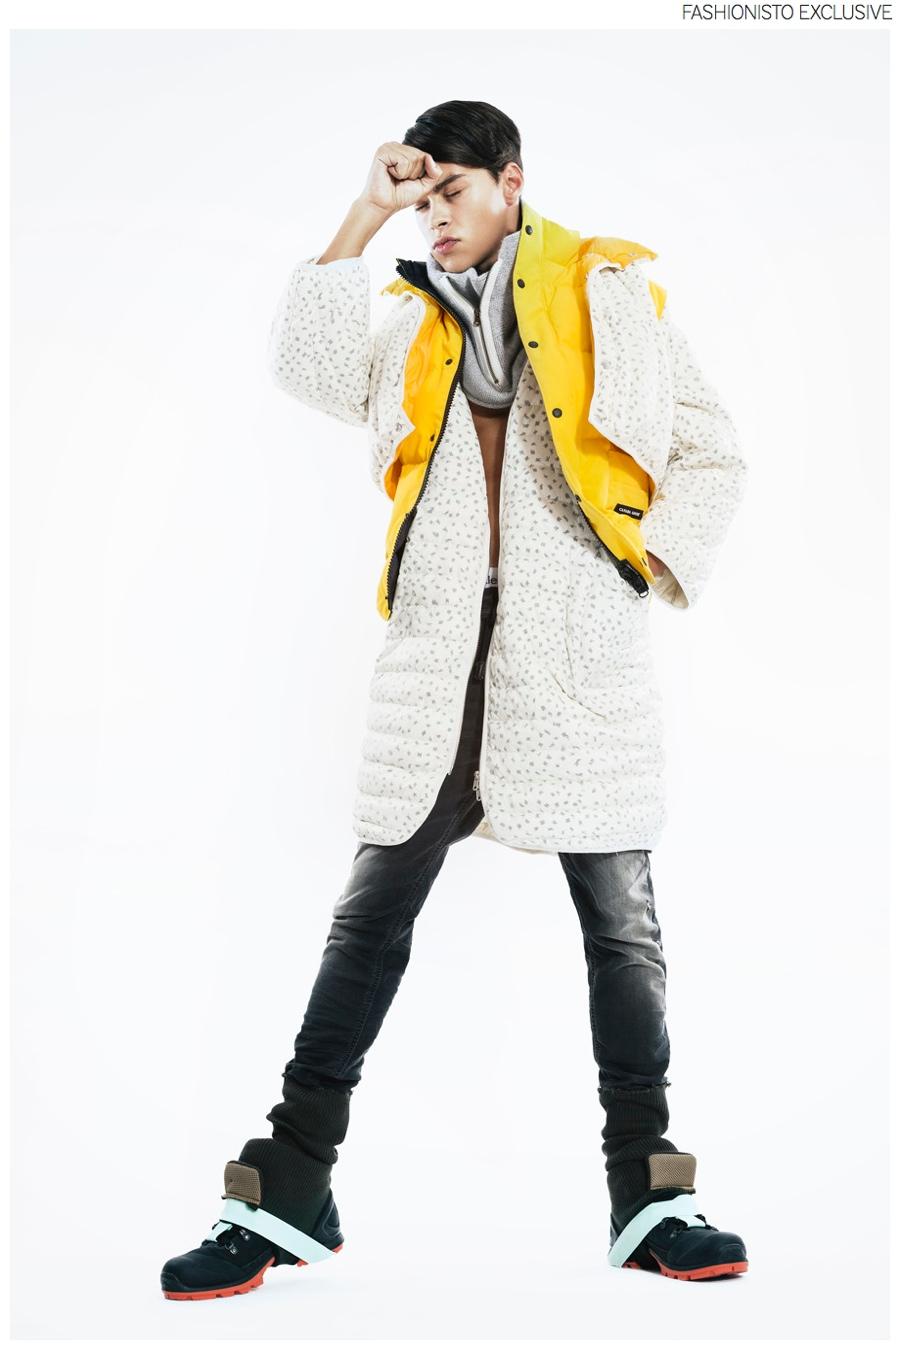 Tobias wears jacket Henrik Vibskov, yellow vest Canada Goose, denim sweatpants Diesel, gray neckpiece Johnnylove and boots Herik Vibskov.